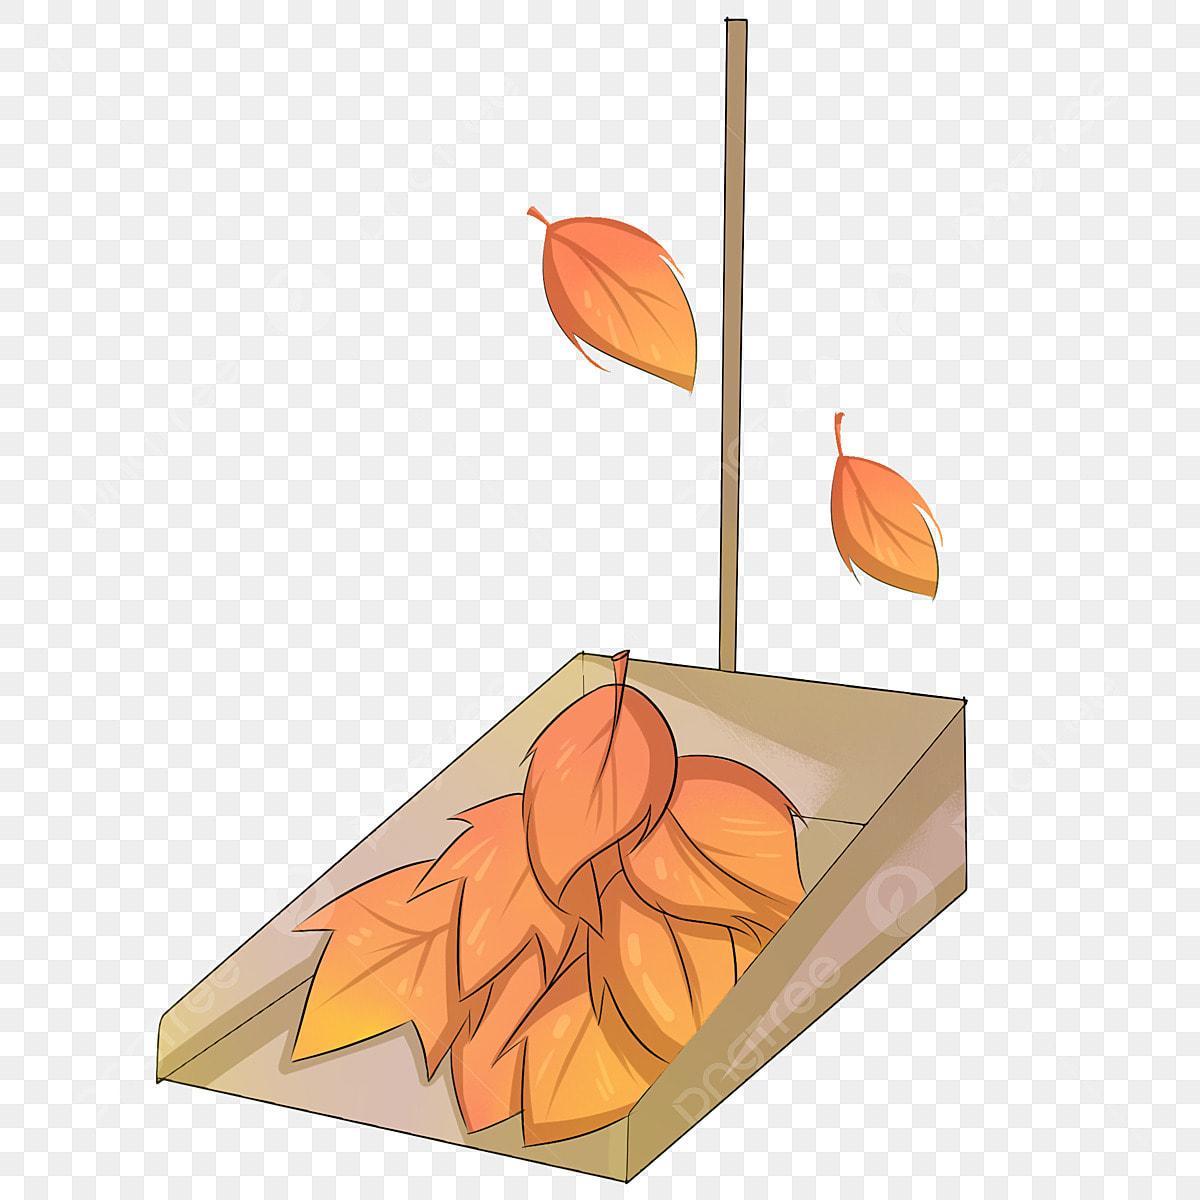 Orange Rainbow Multiplication Table, Vector Material